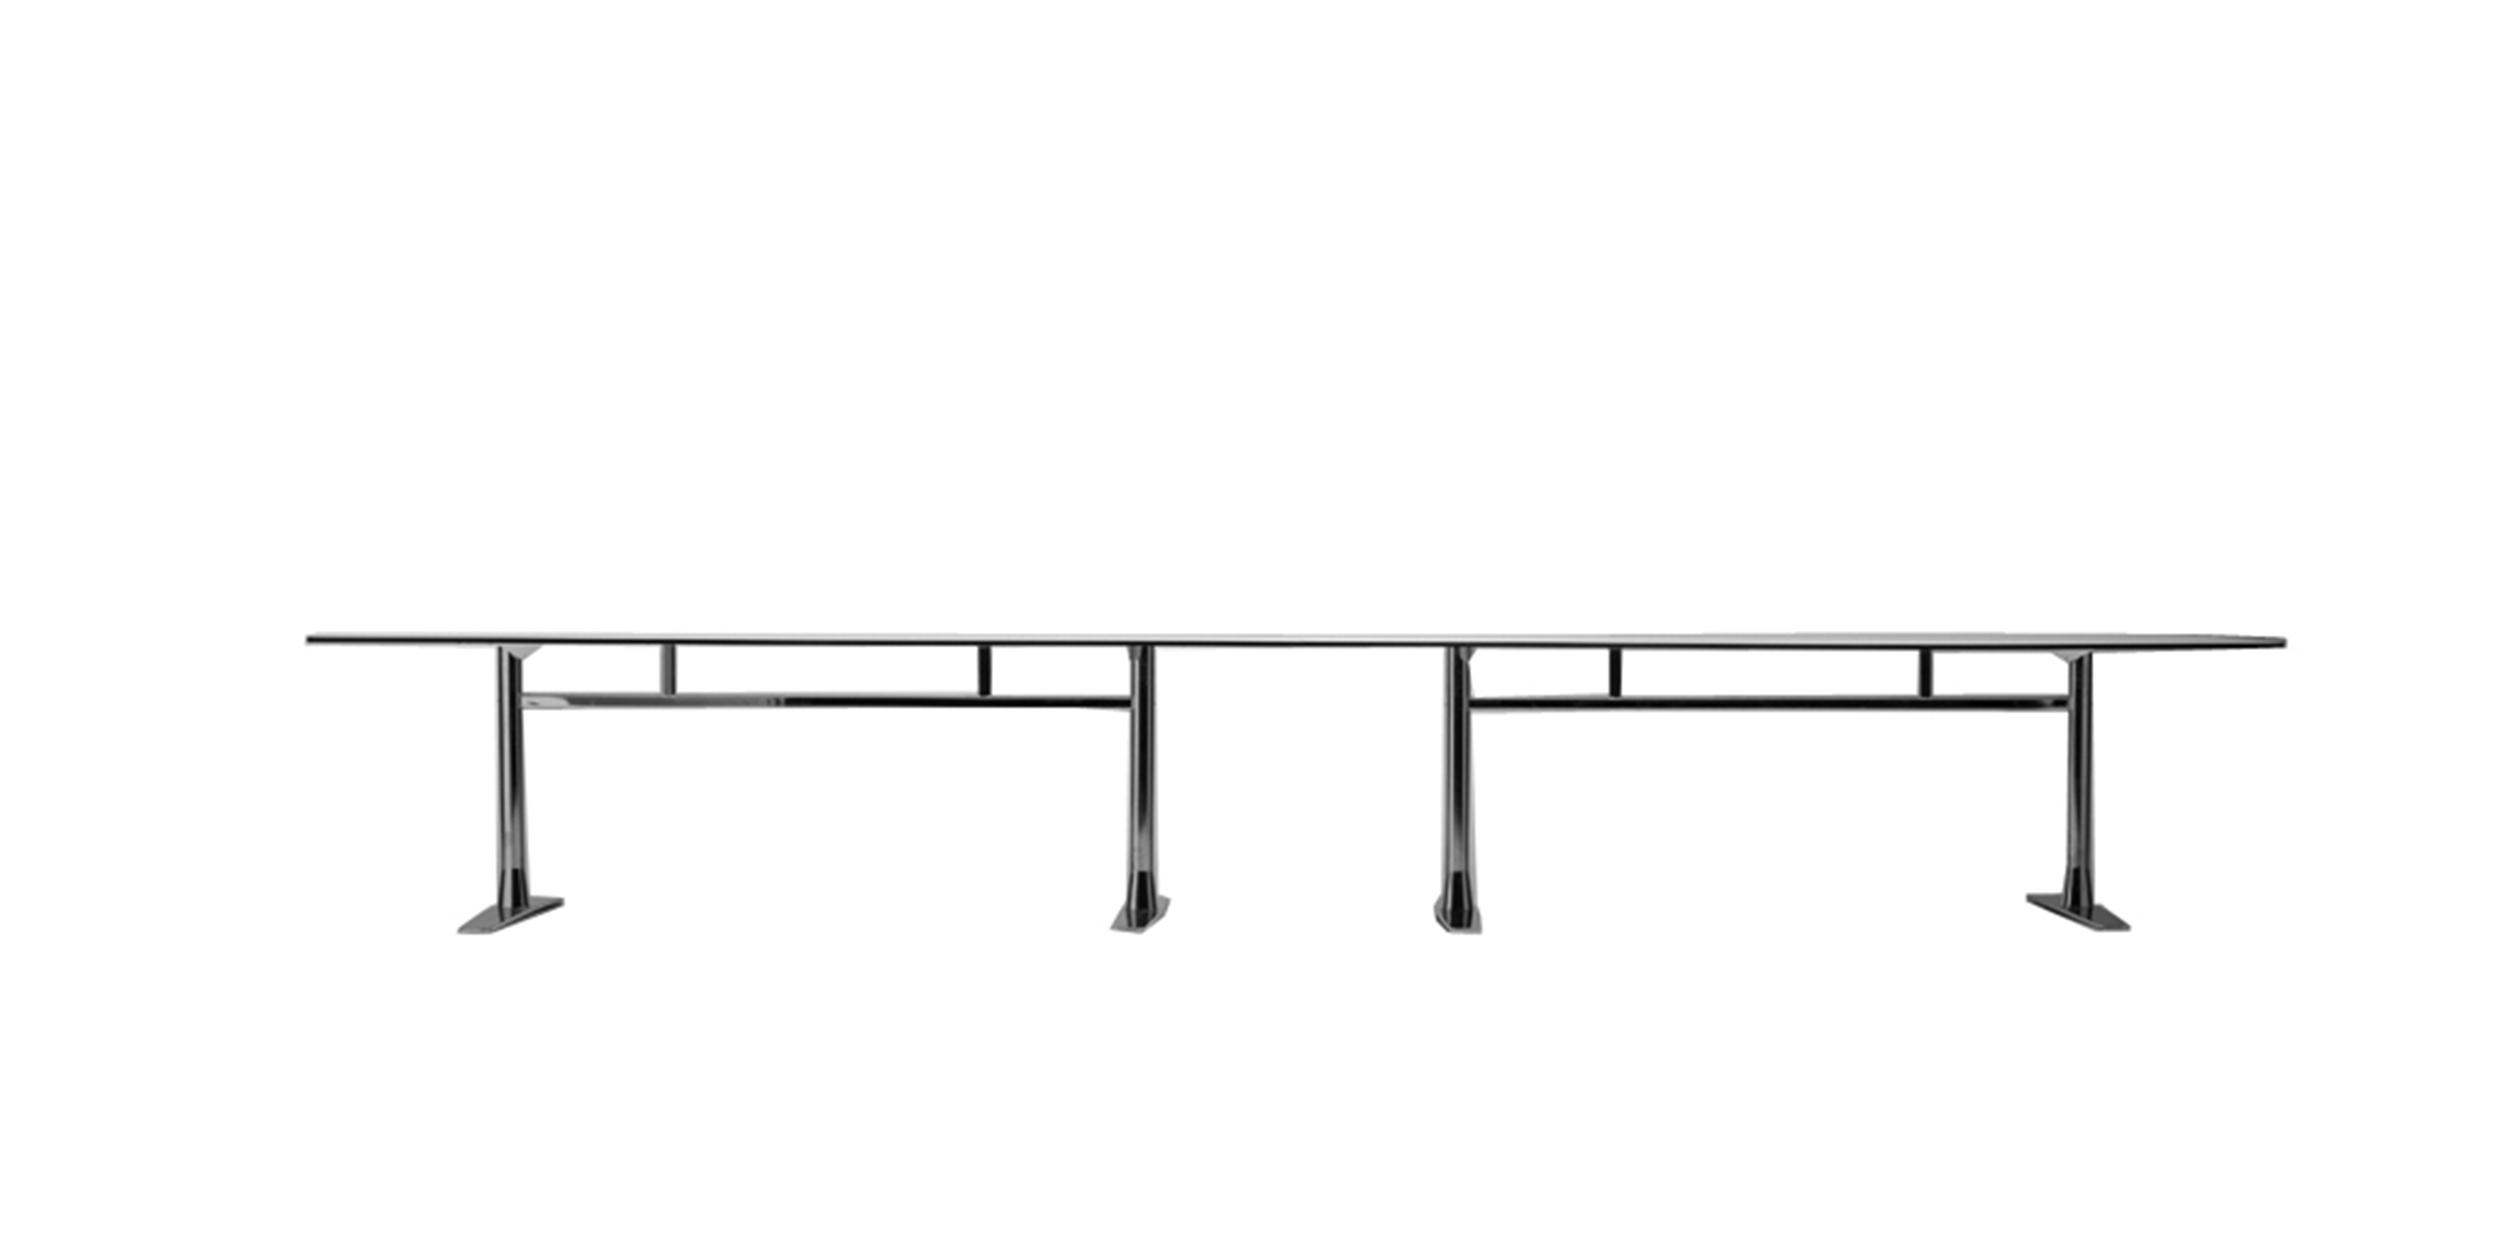 Propeller, 4800 x 1100, H720 mm by Claesson Koivisto Rune